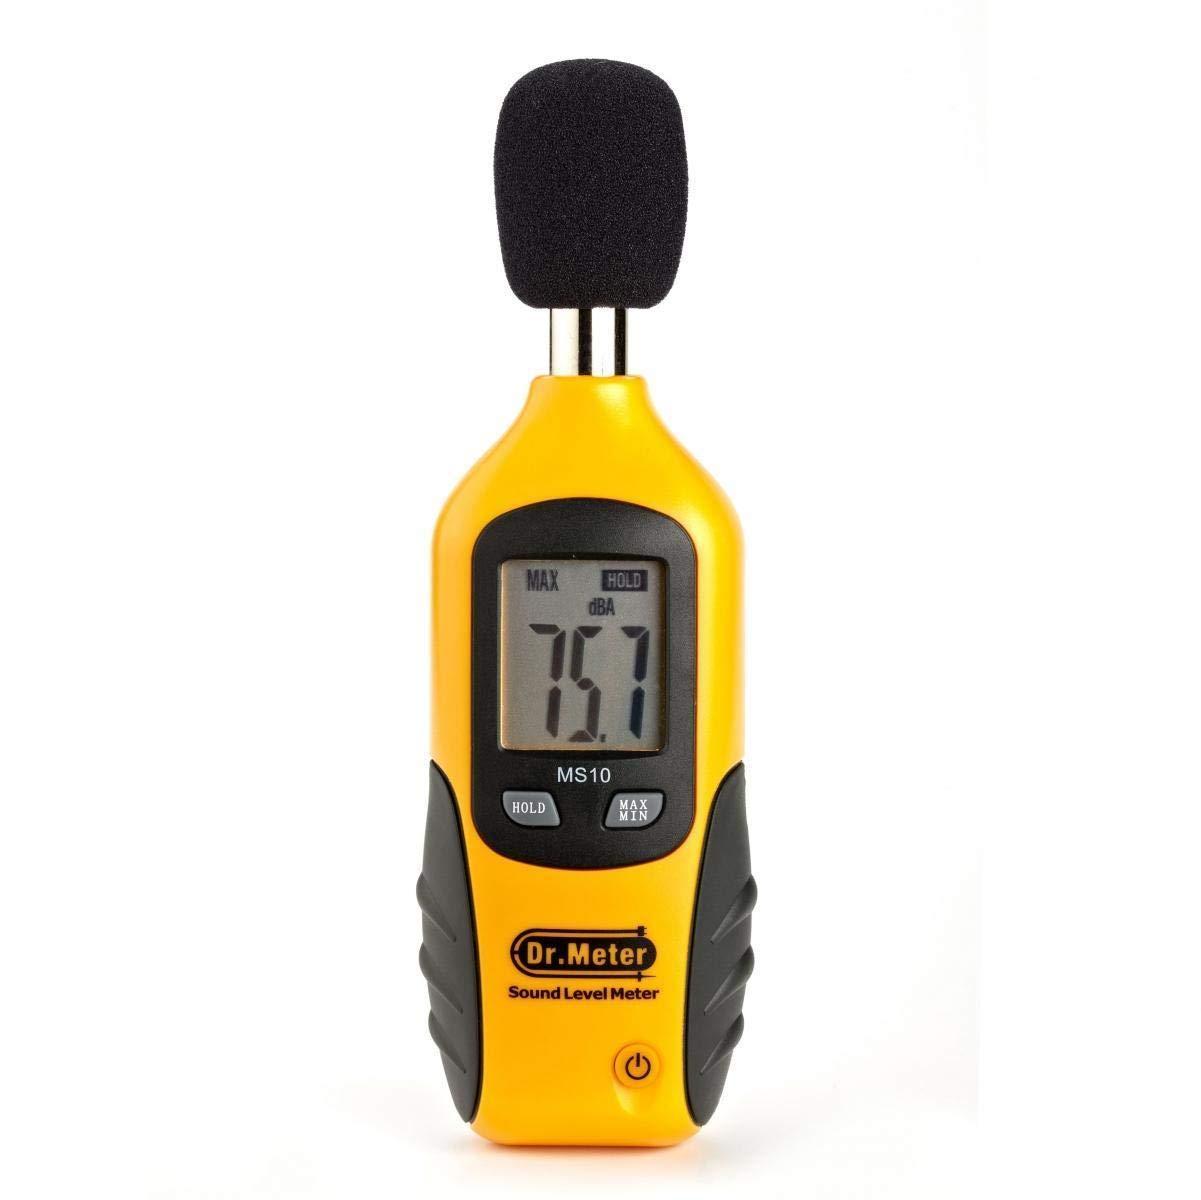 Dr.Meter Digital Sound Pressure Tester Meter 40-130dB Decibel Noise Measurement